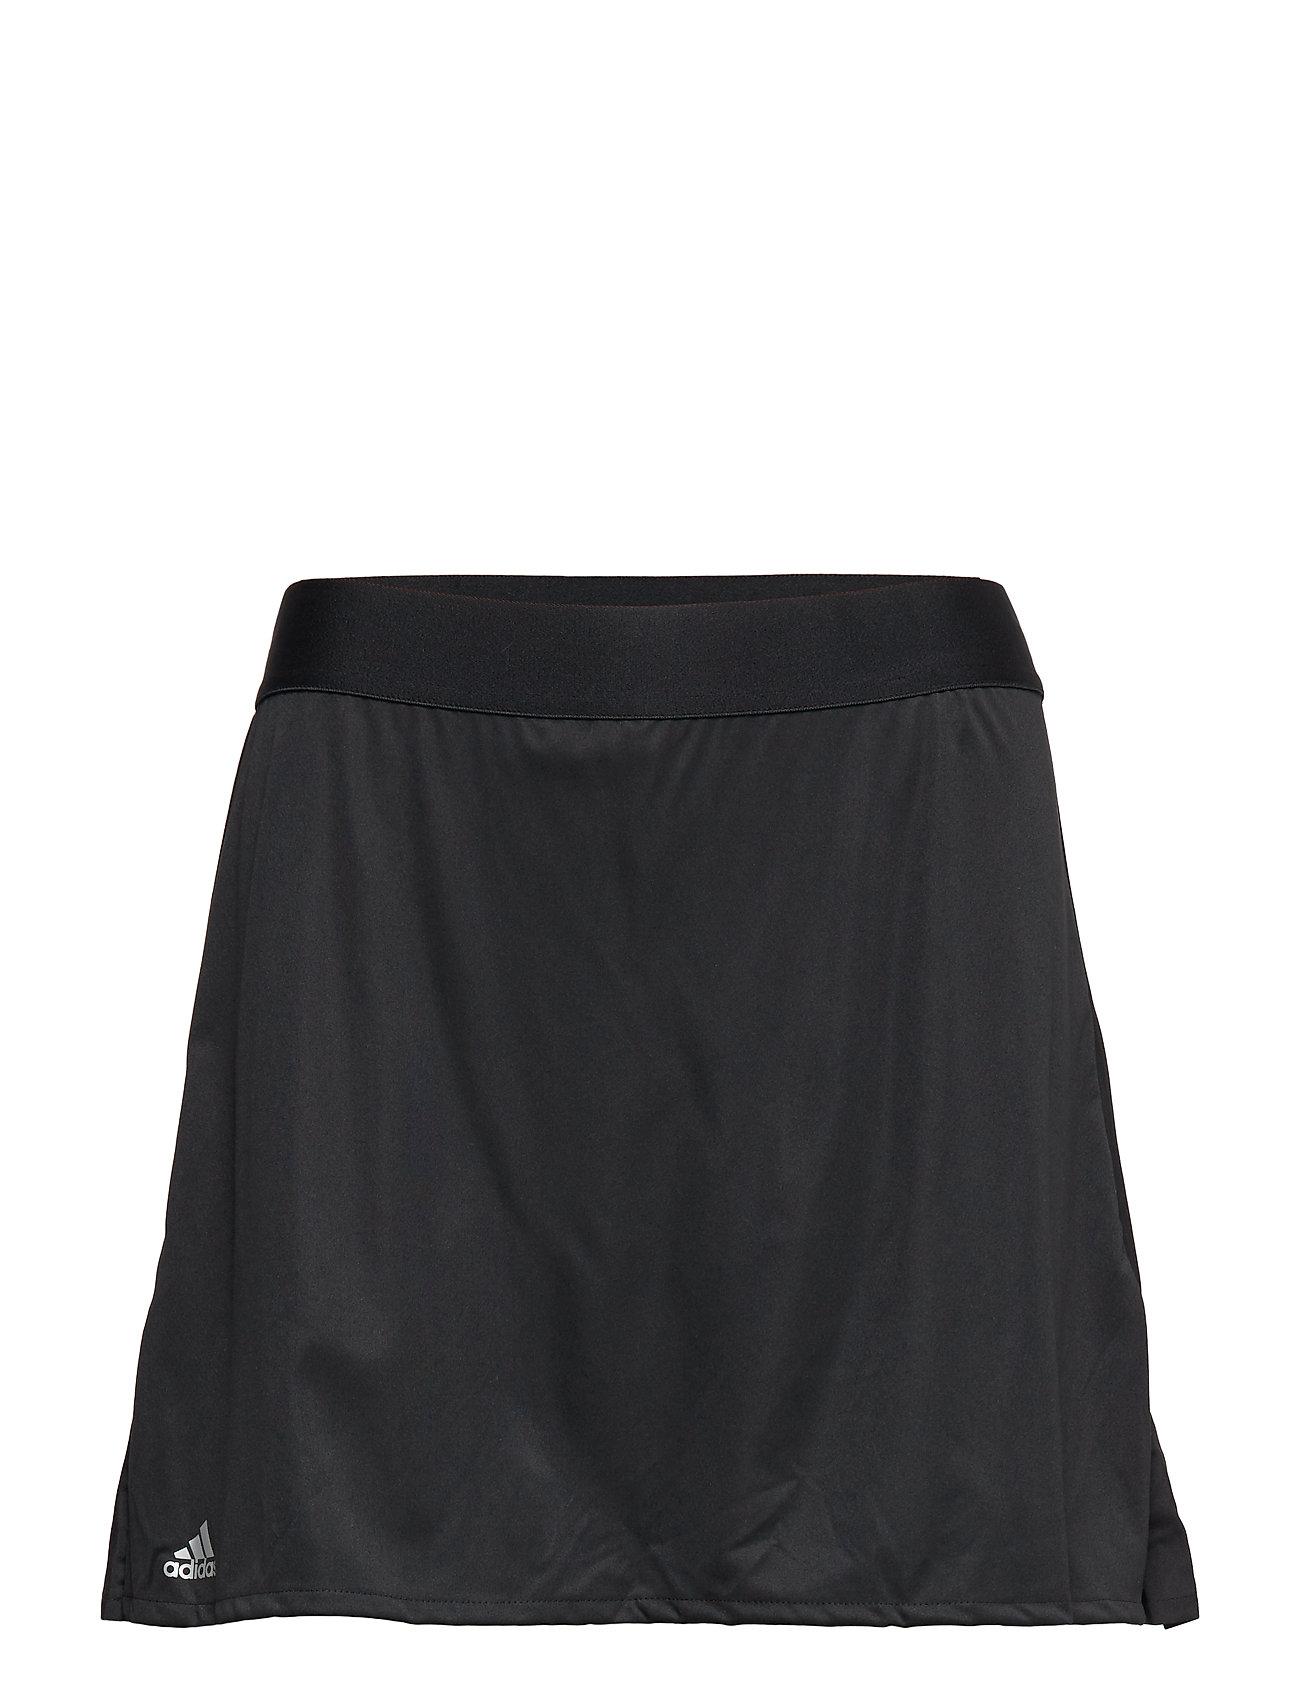 adidas Tennis Skirt In Black